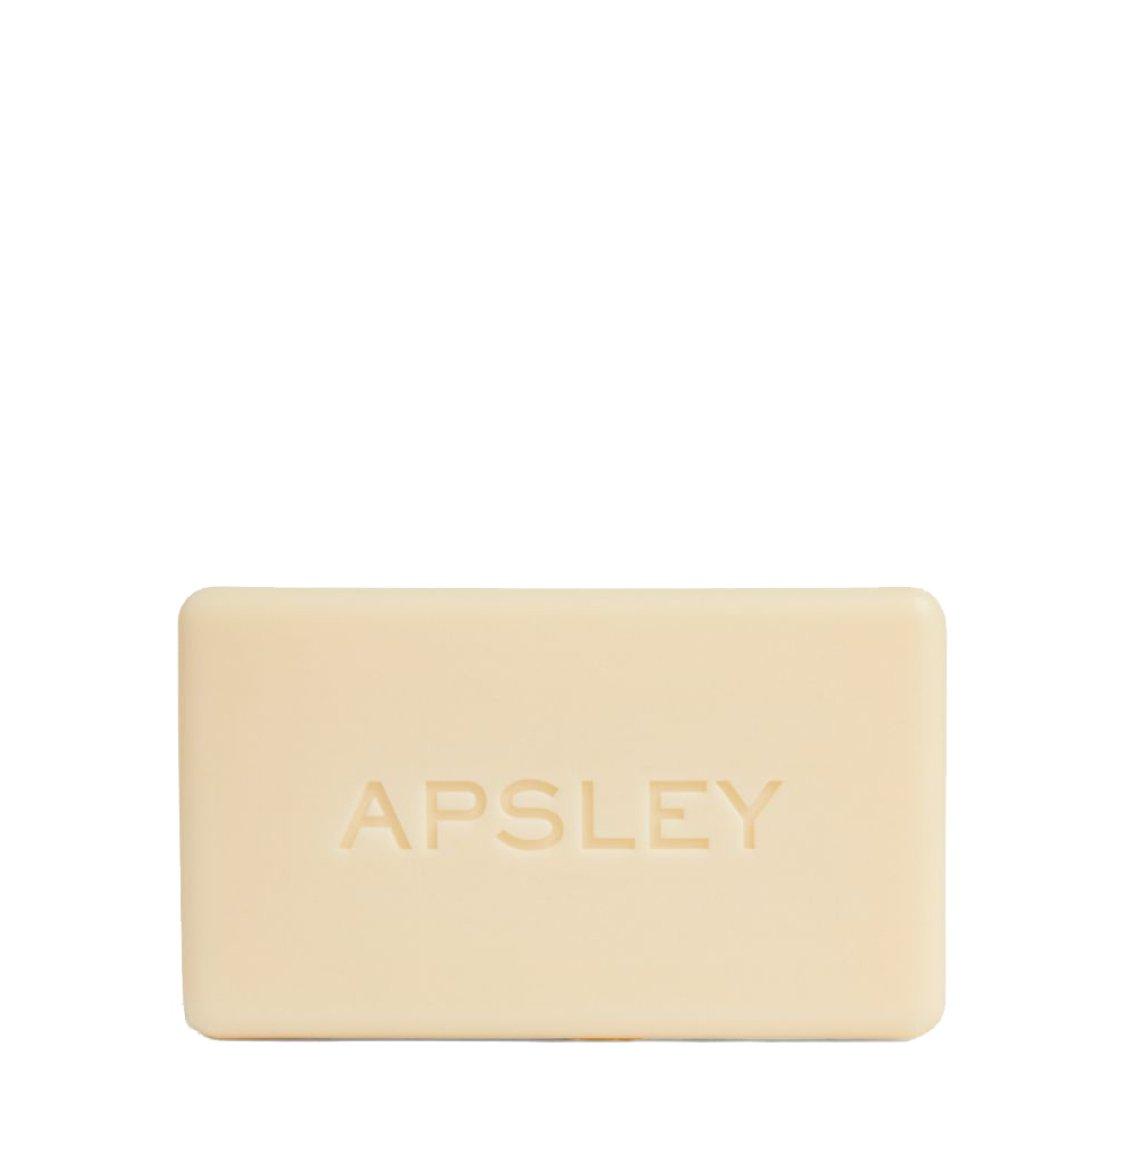 Truefitt And Hill Apsley Bath Bar Soap 200g